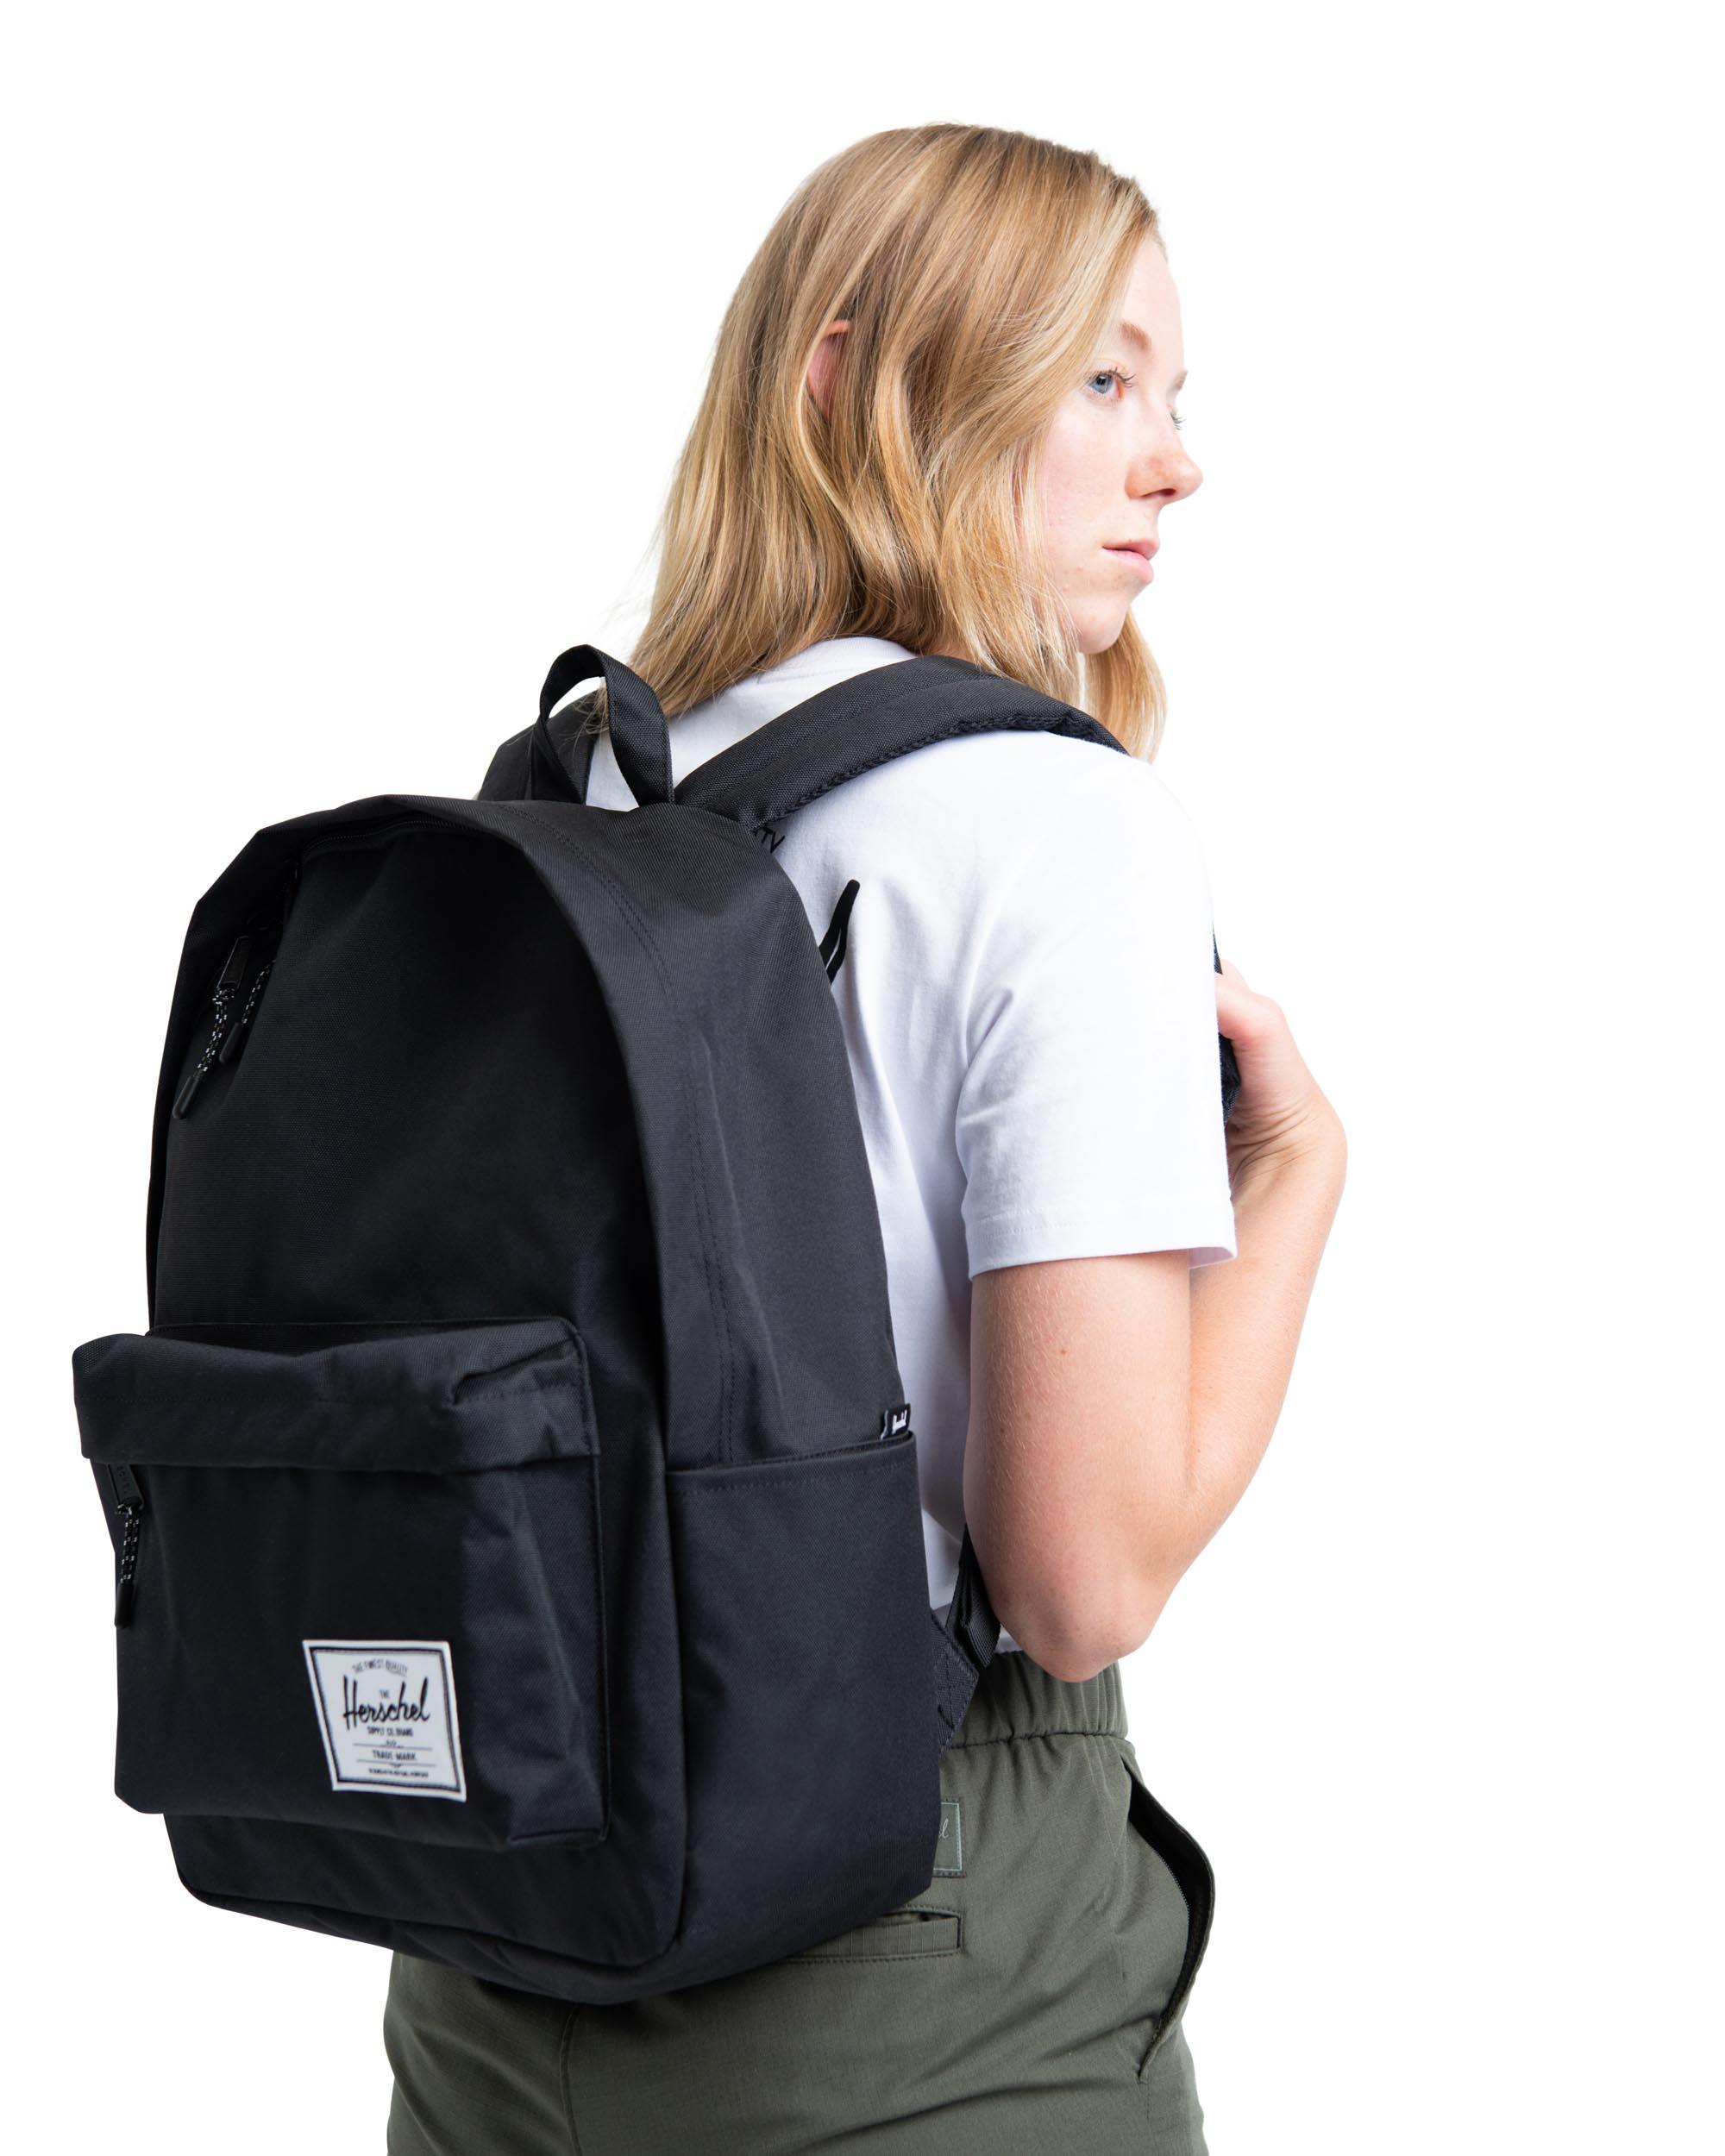 Herschel Classic X-large Backpack Navy Blau Novel Design; In